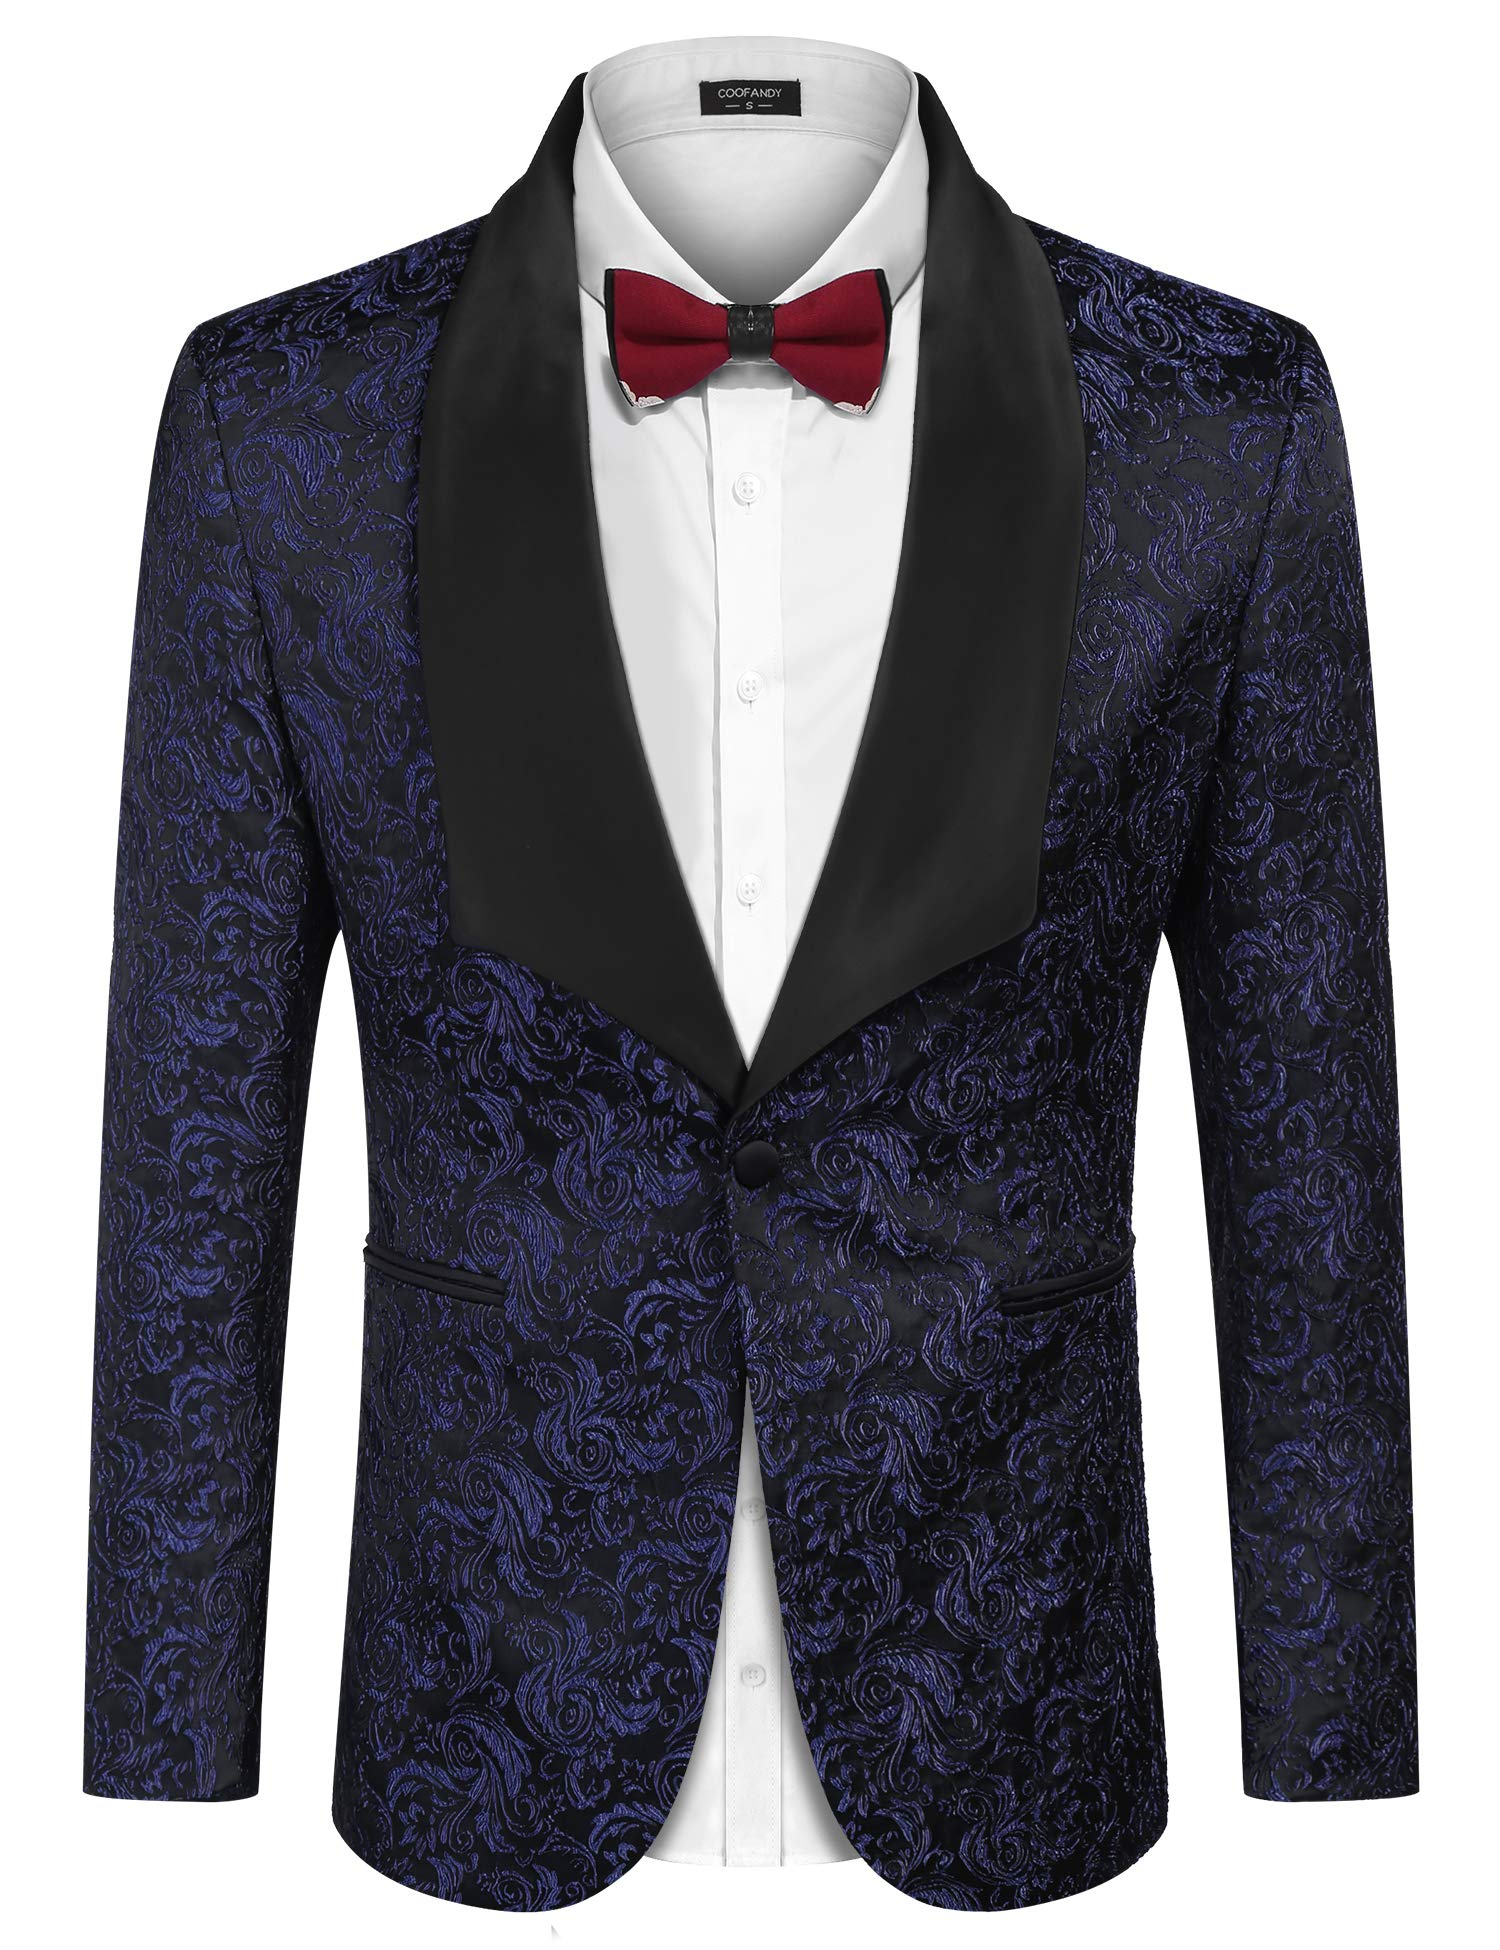 COOFANDY Men's Floral Party Dress Suit Stylish Dinner Jacket Wedding Blazer Prom Tuxedo